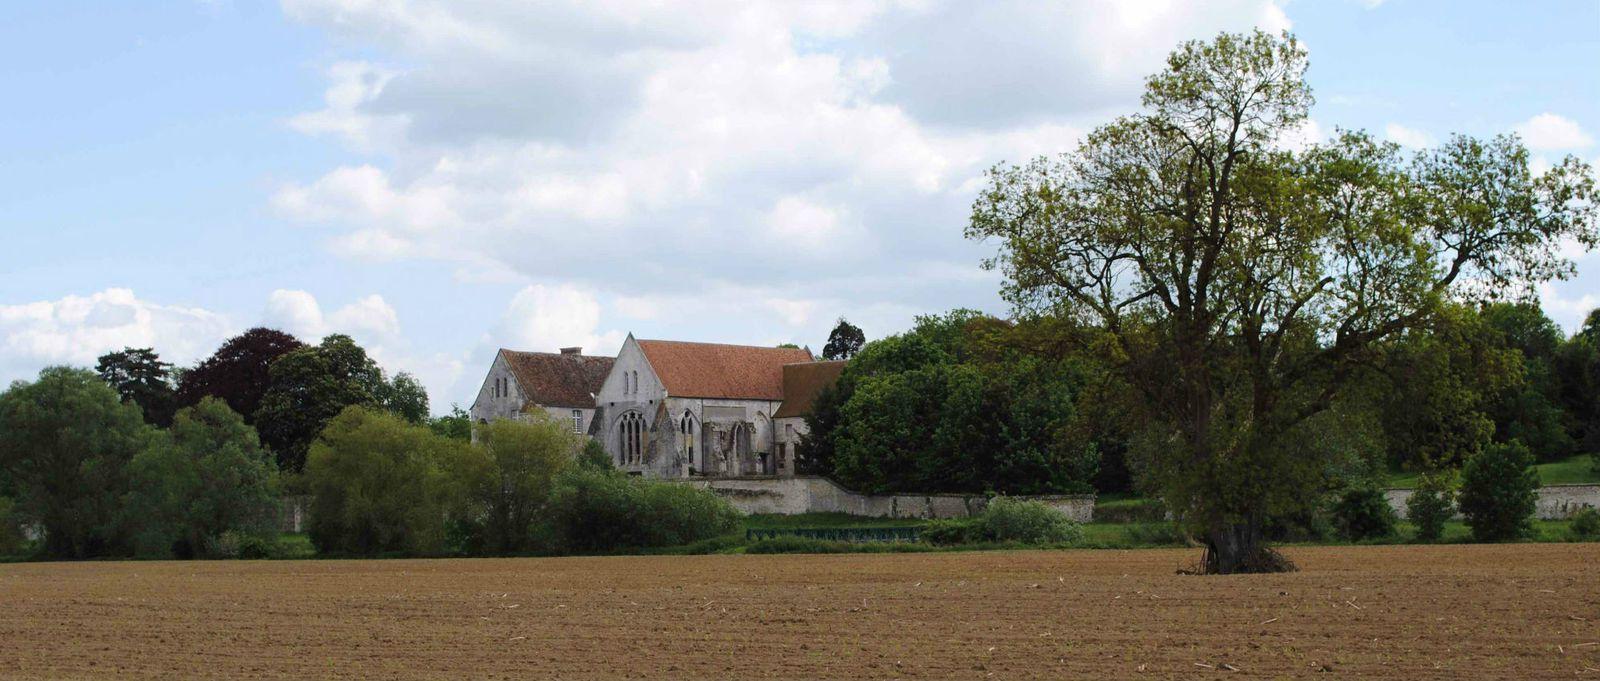 face à l'ancienne abbaye cistercienne